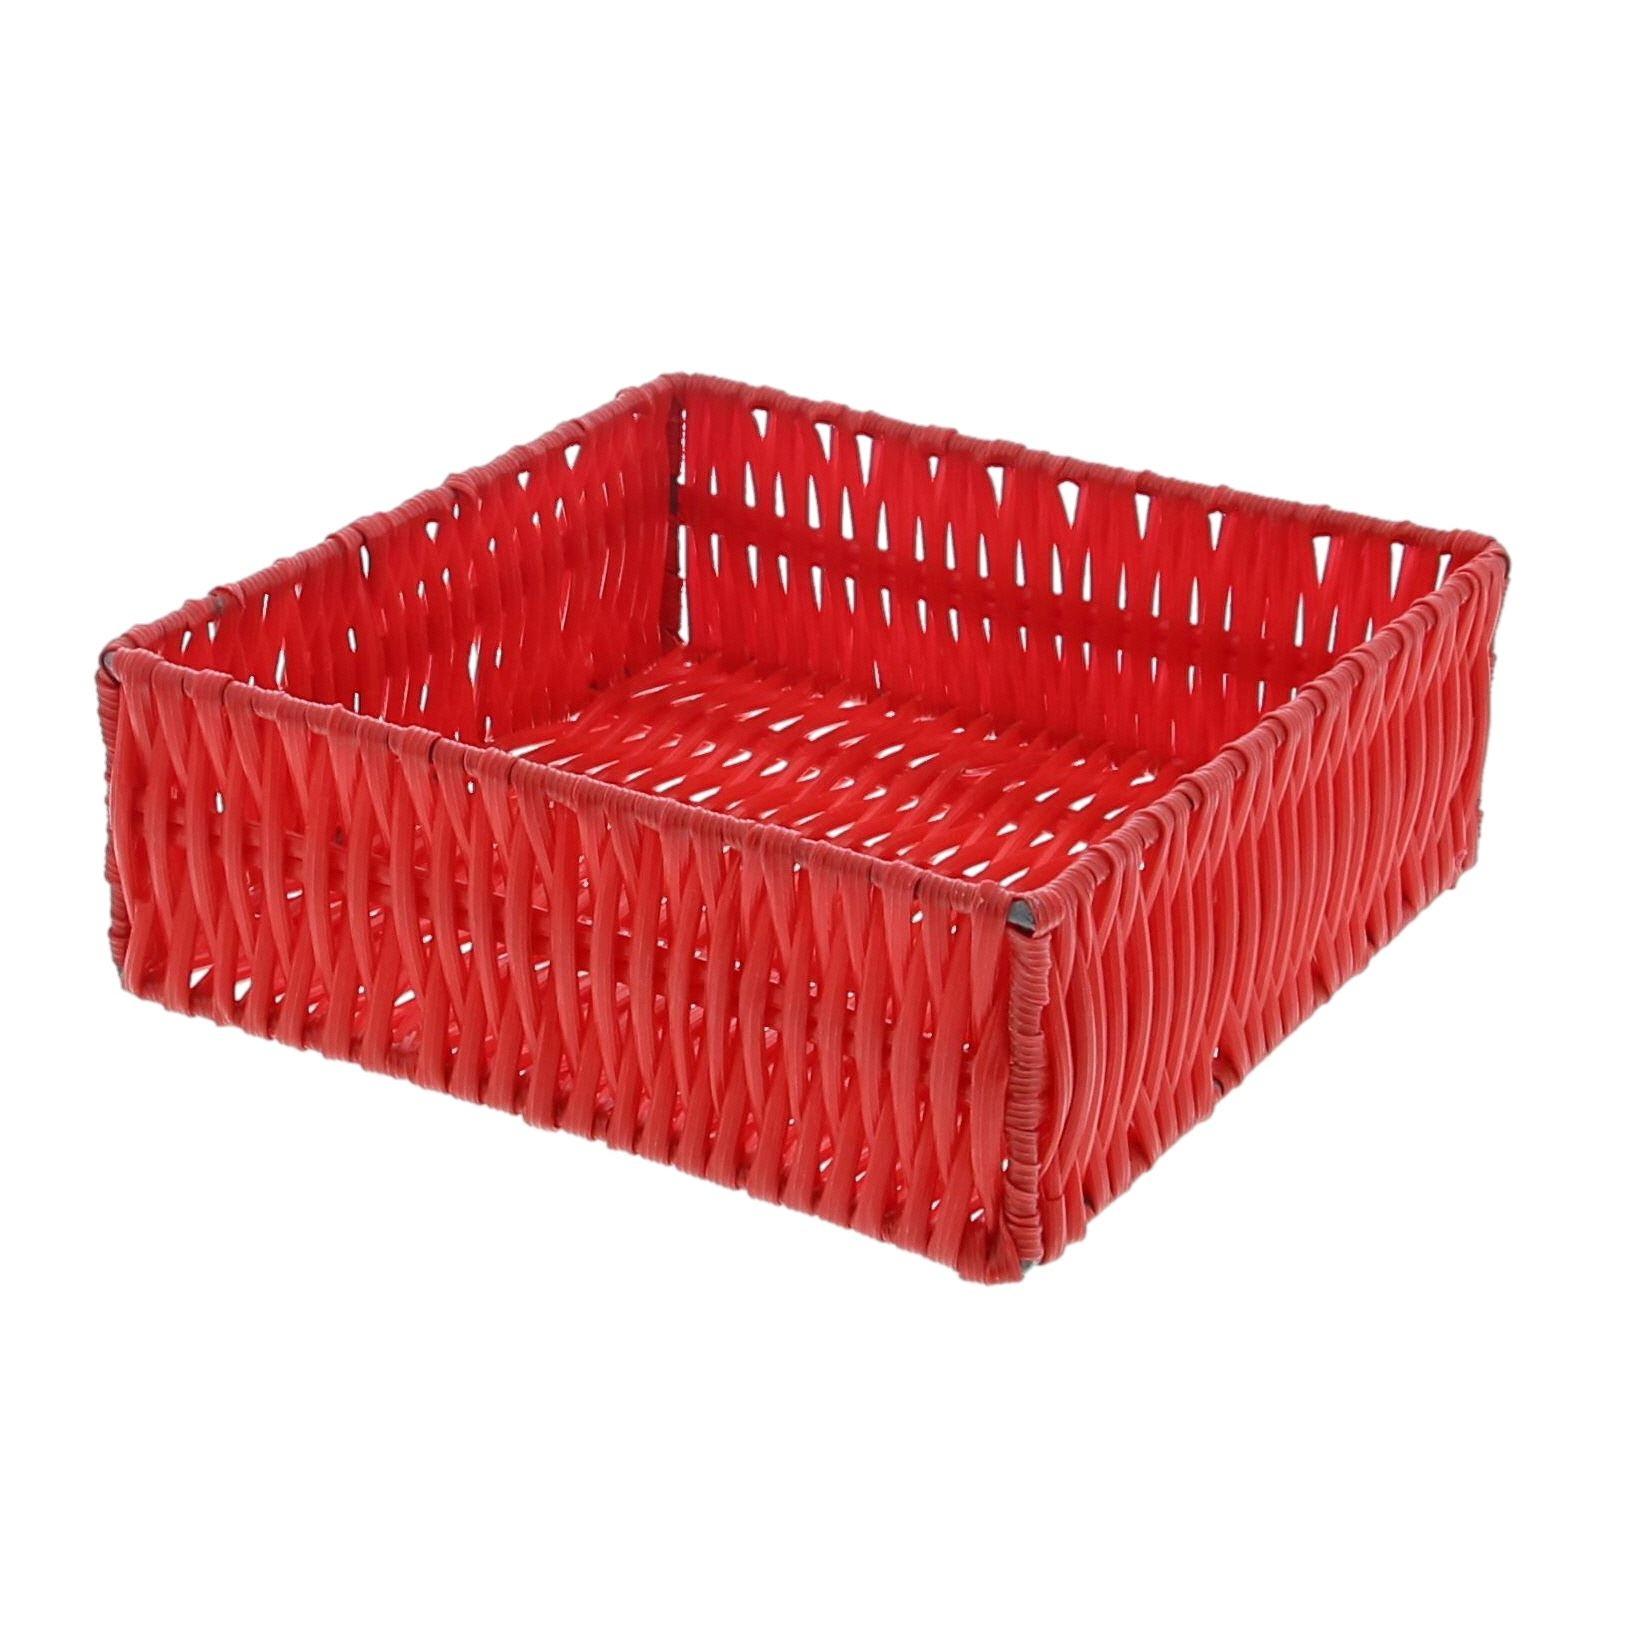 Quadratischer Kunststoffkorb - Rot  - 6 Stück